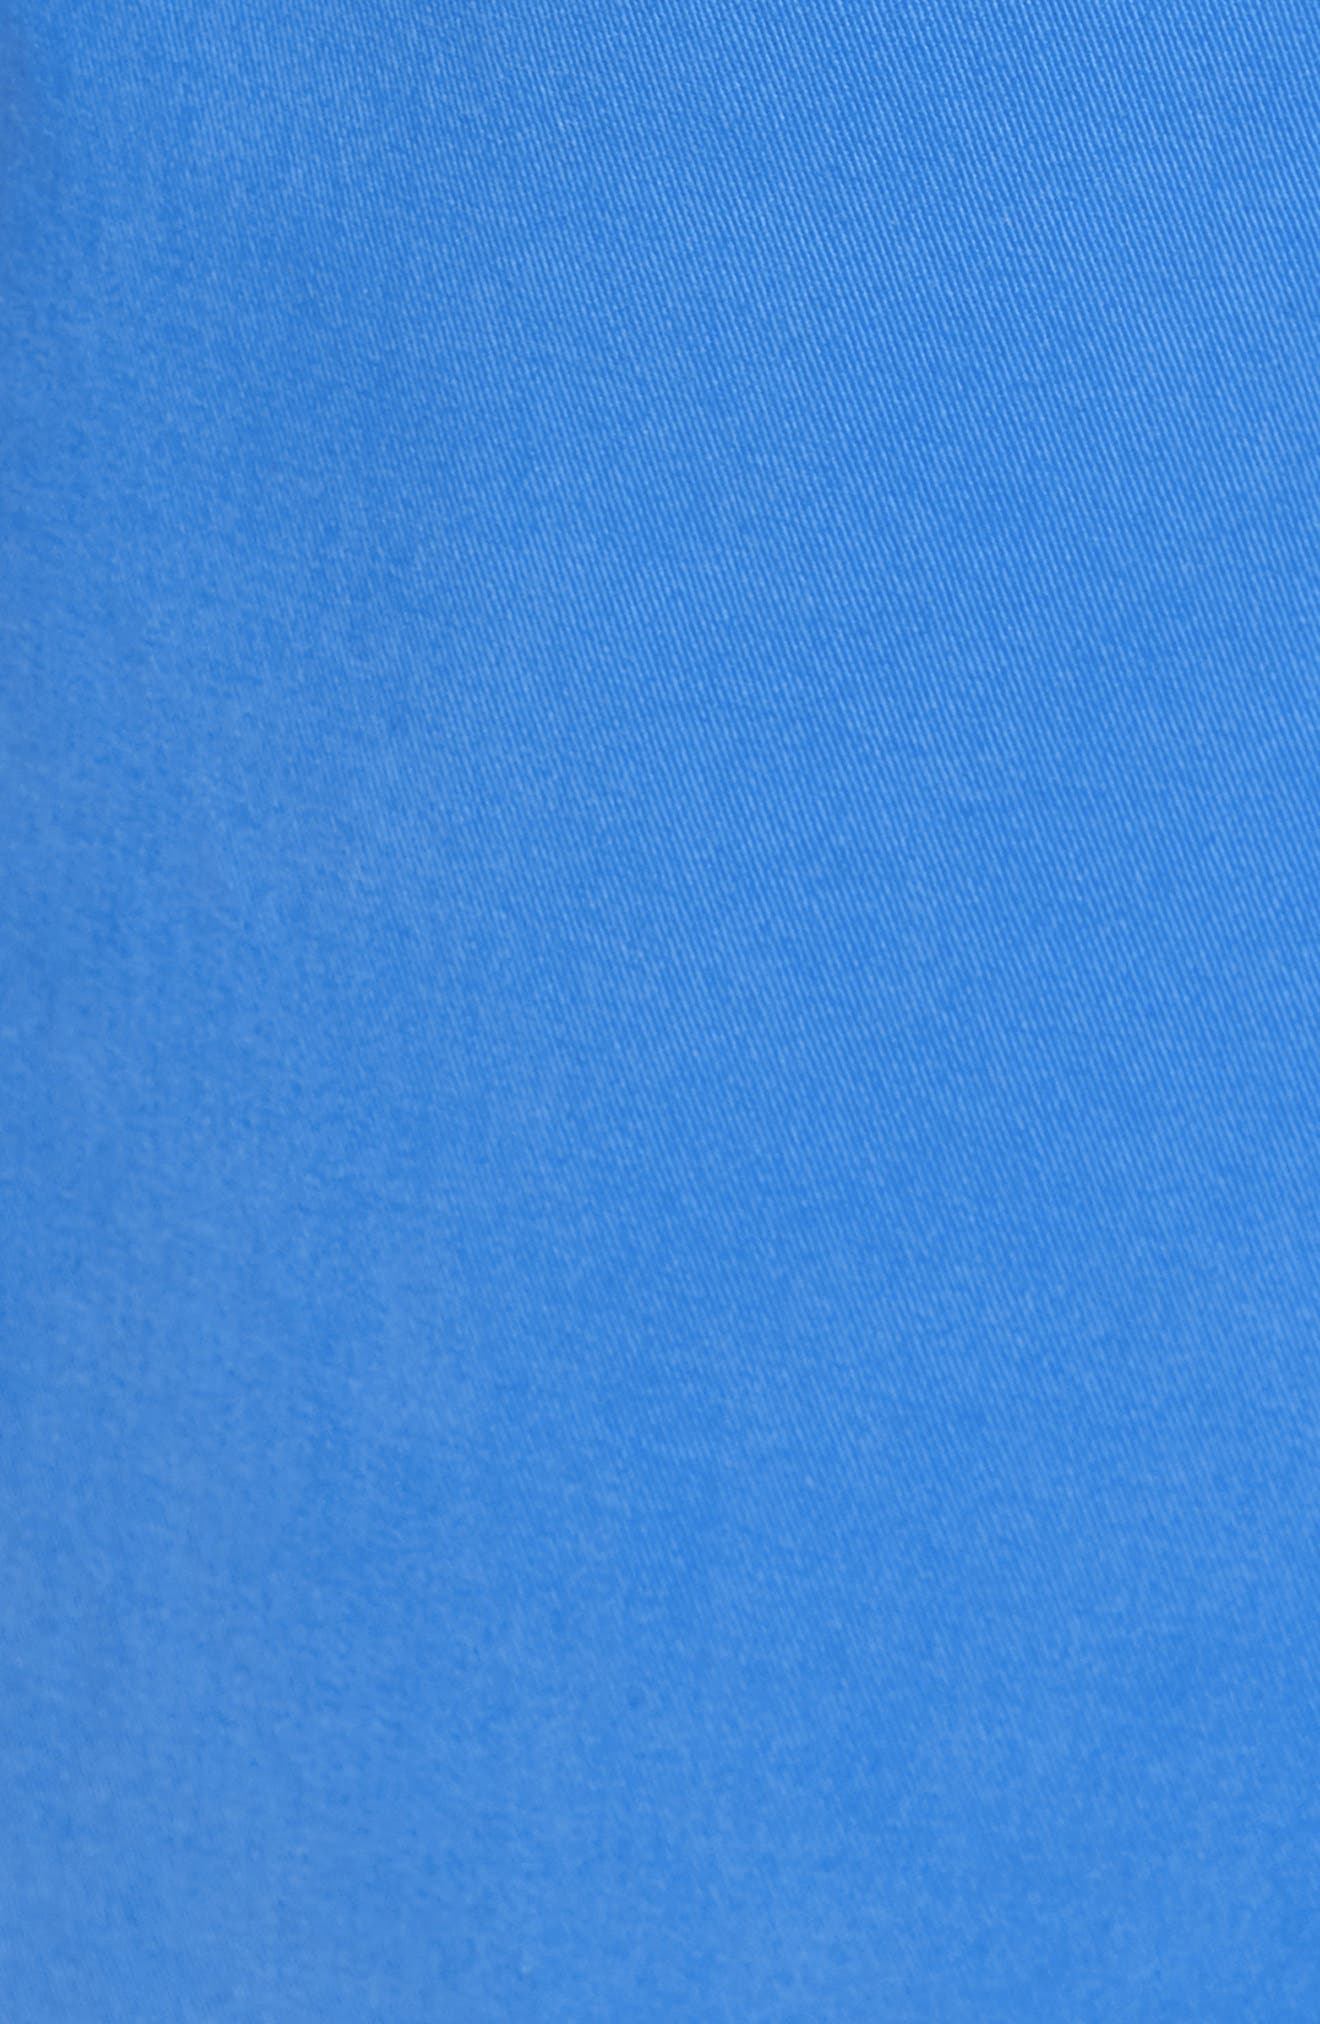 Ballard Slim Fit Stretch Chino 9-Inch Shorts,                             Alternate thumbnail 57, color,